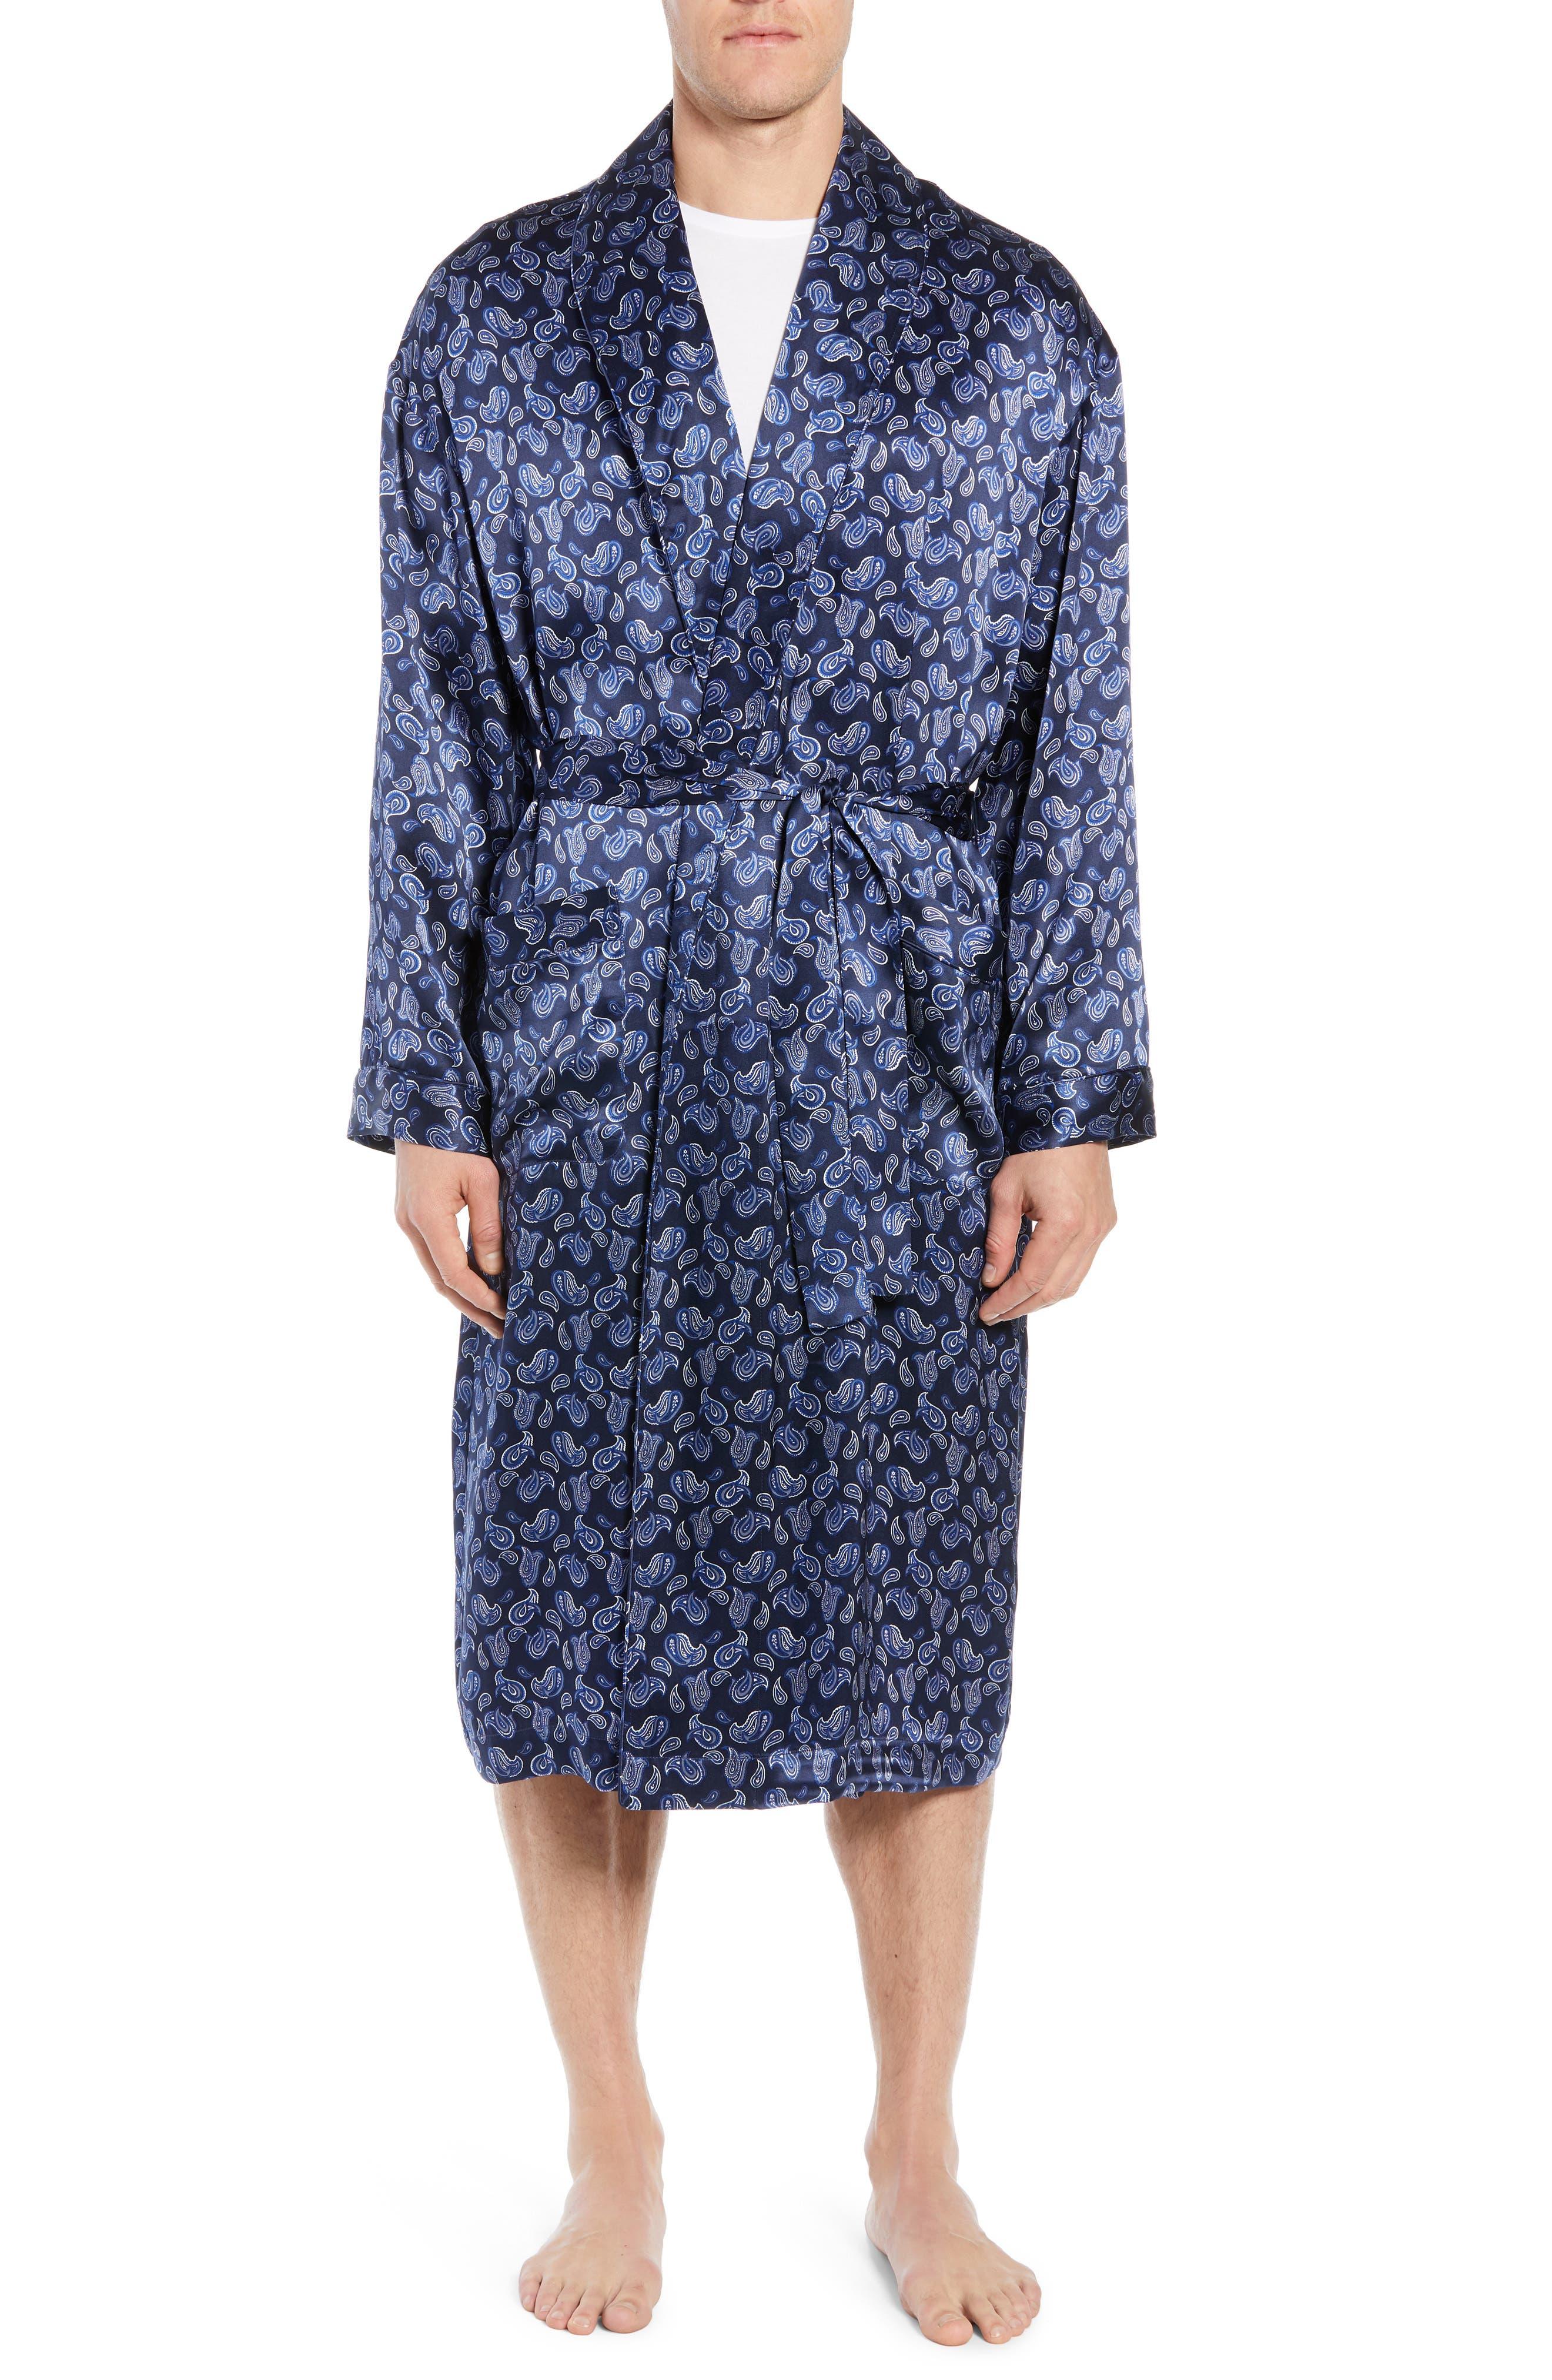 1940s Men's Underwear: Briefs, Boxers, Unions, & Socks Mens Majestic International Sapphire Silk Robe $325.00 AT vintagedancer.com